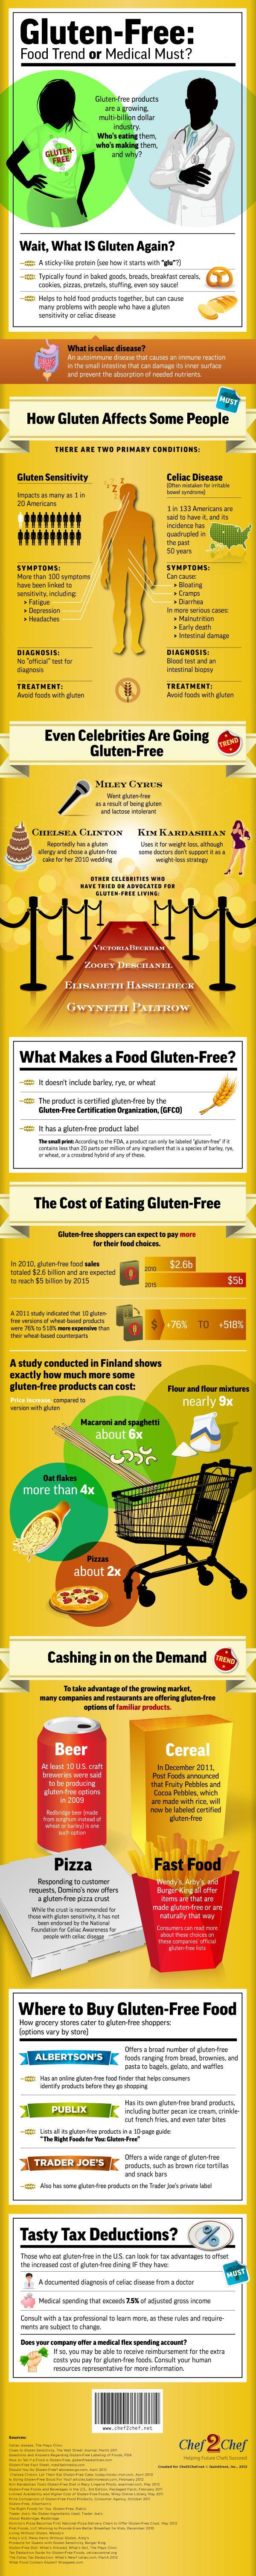 Gluten-Free: Food Trend or Medical Must? #suja #sujajuice #health #nutrition #juicecleanse #itsthejuice #detox #organic #wholefoods #nongmo